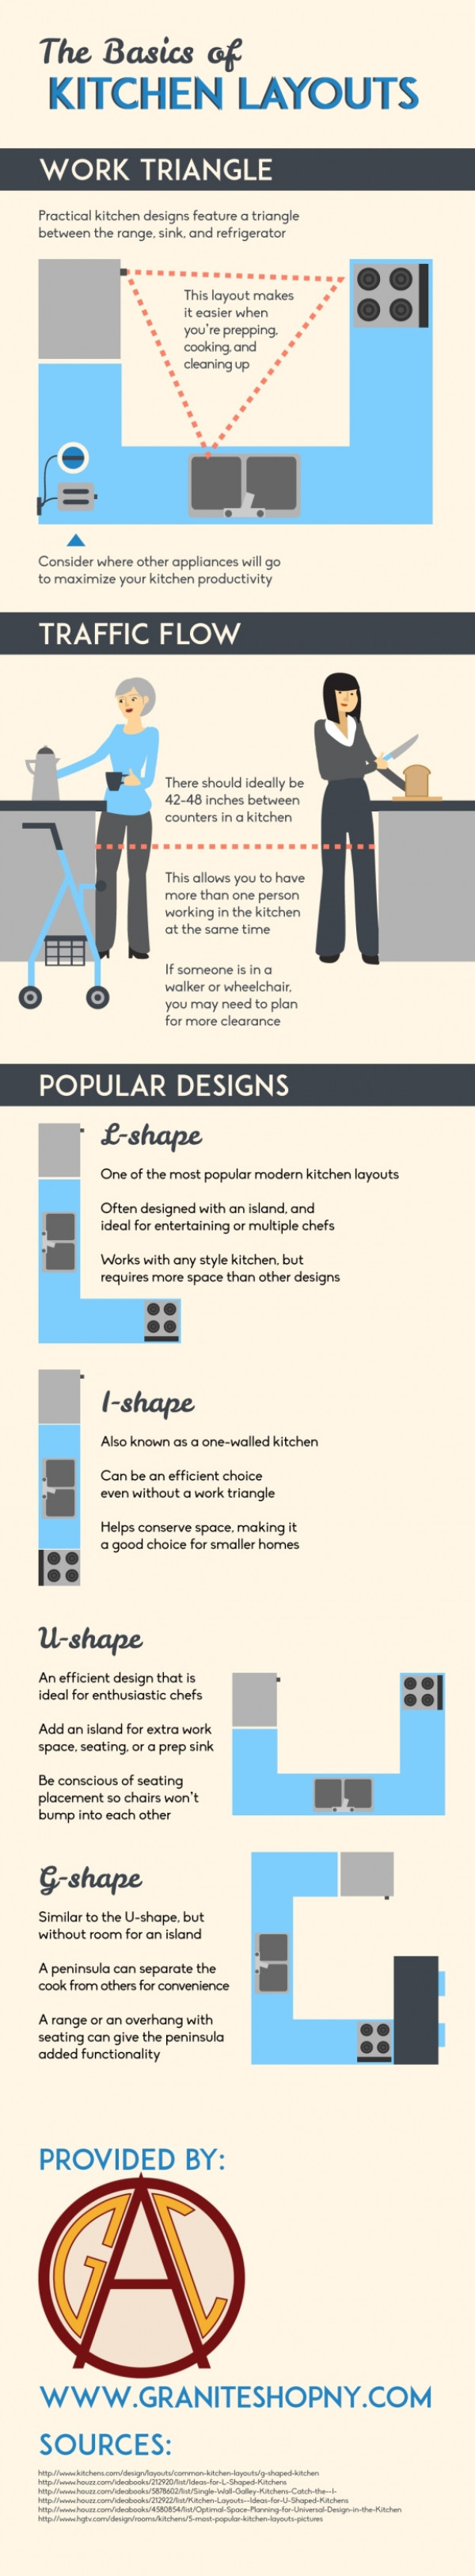 THE BASICS OF KITCHEN LAYOUTS